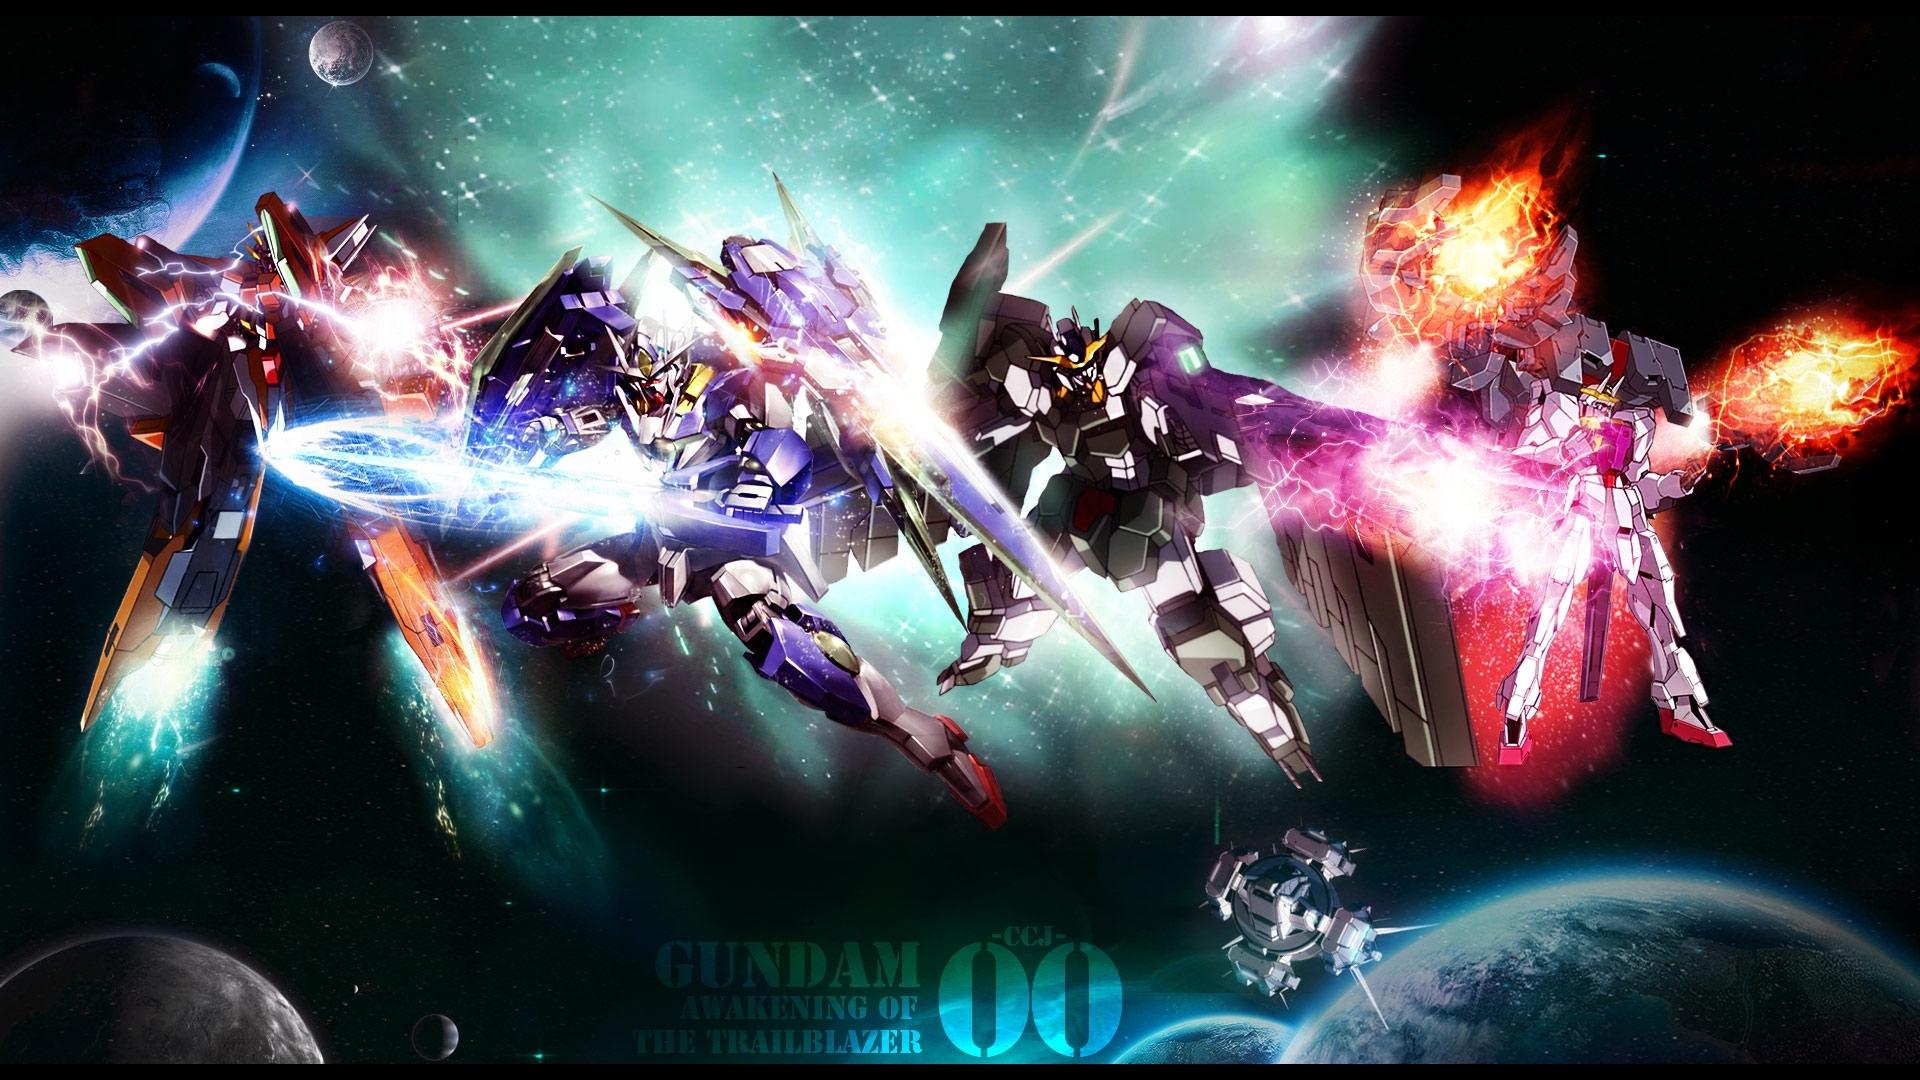 gundam full hd wallpaper and background image | 1920x1080 | id:226516